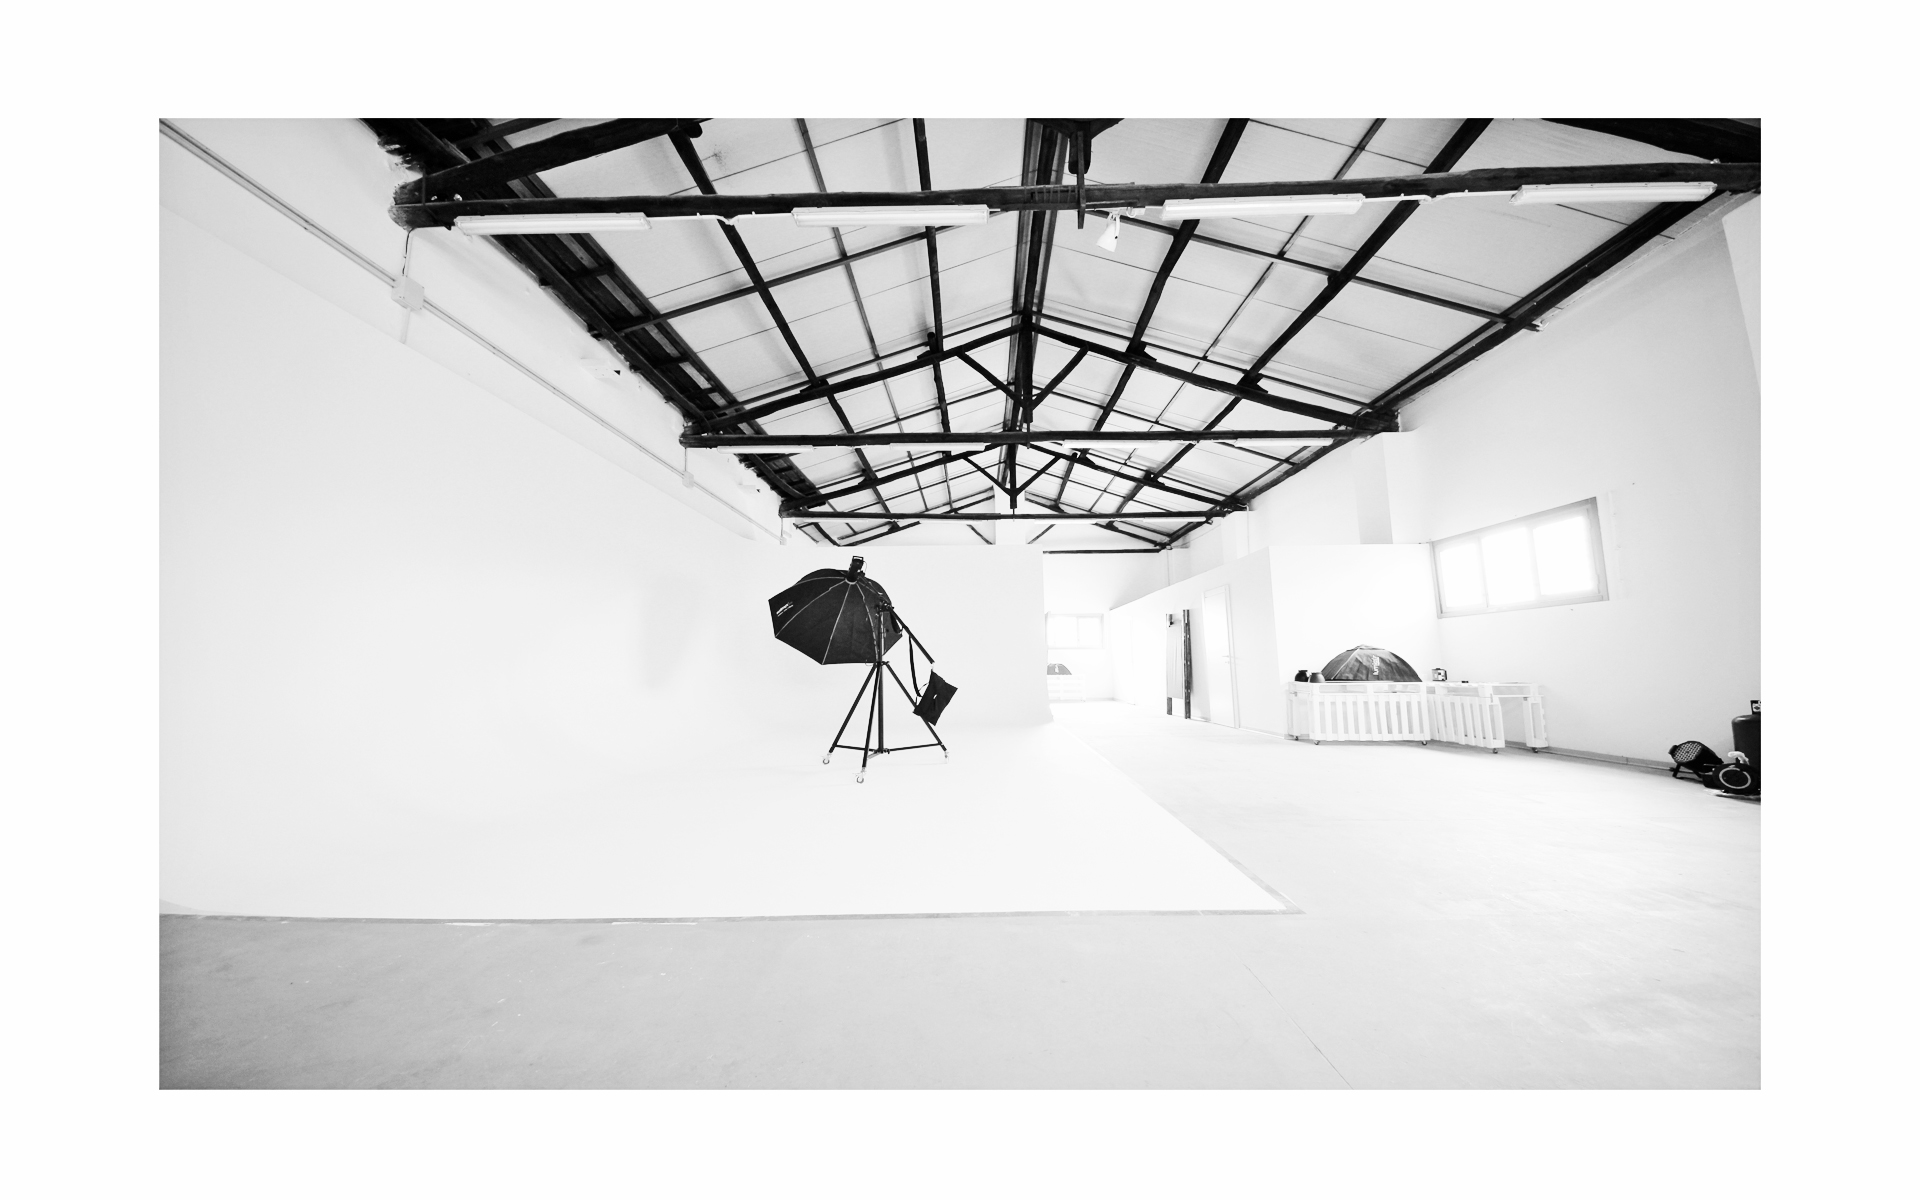 studio fotografico roma sala posa limbo Lumina Sense art lab